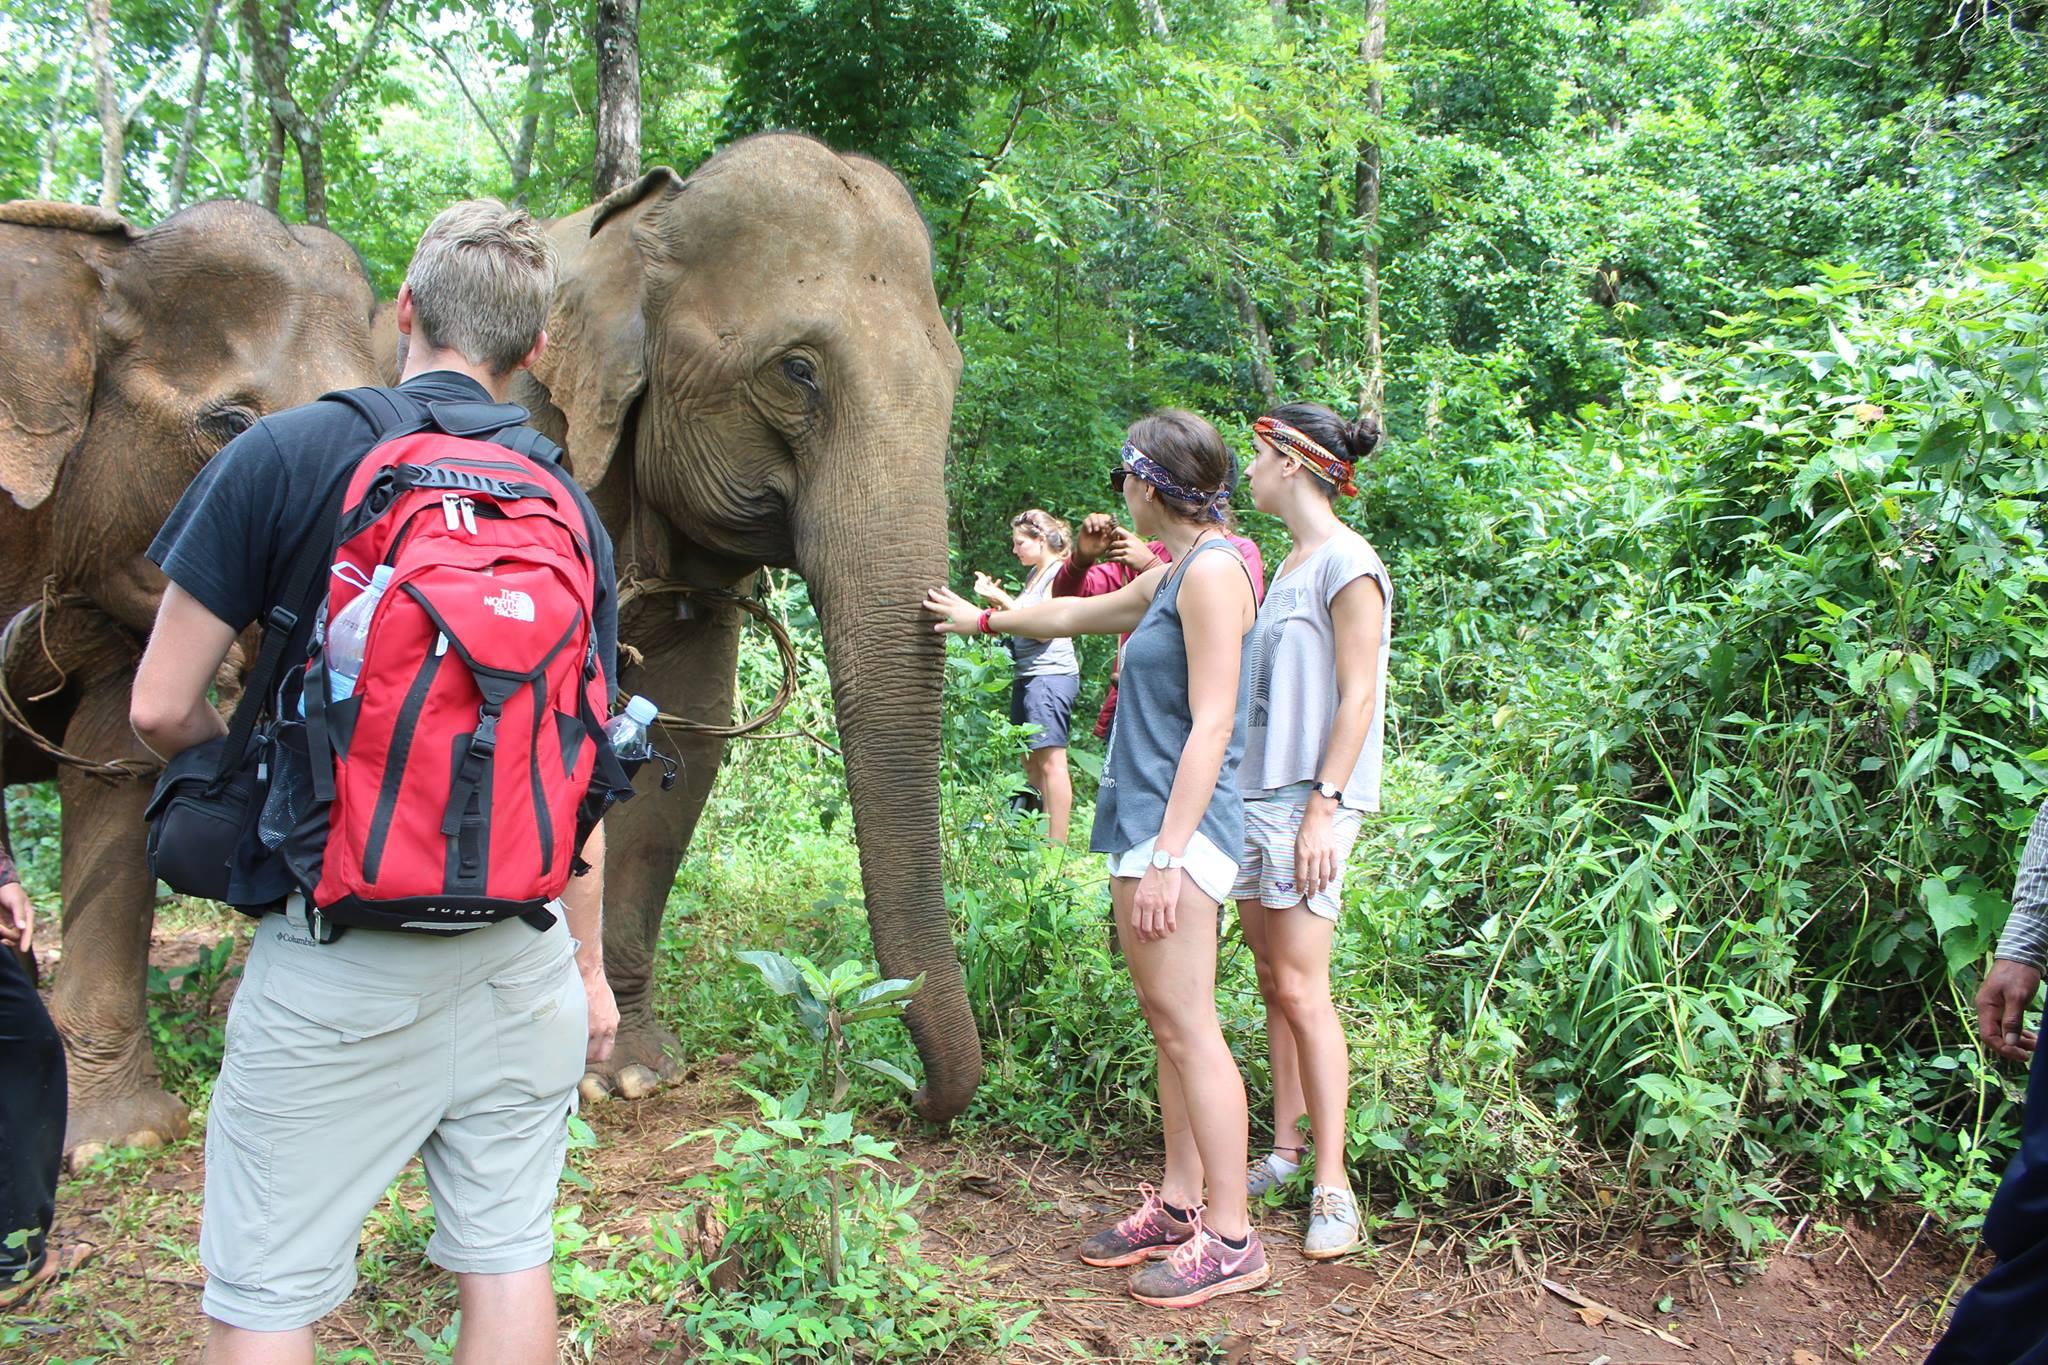 Green Cultural Travel - Cambodia - Mondulkiri - Elephants interacting with tourists